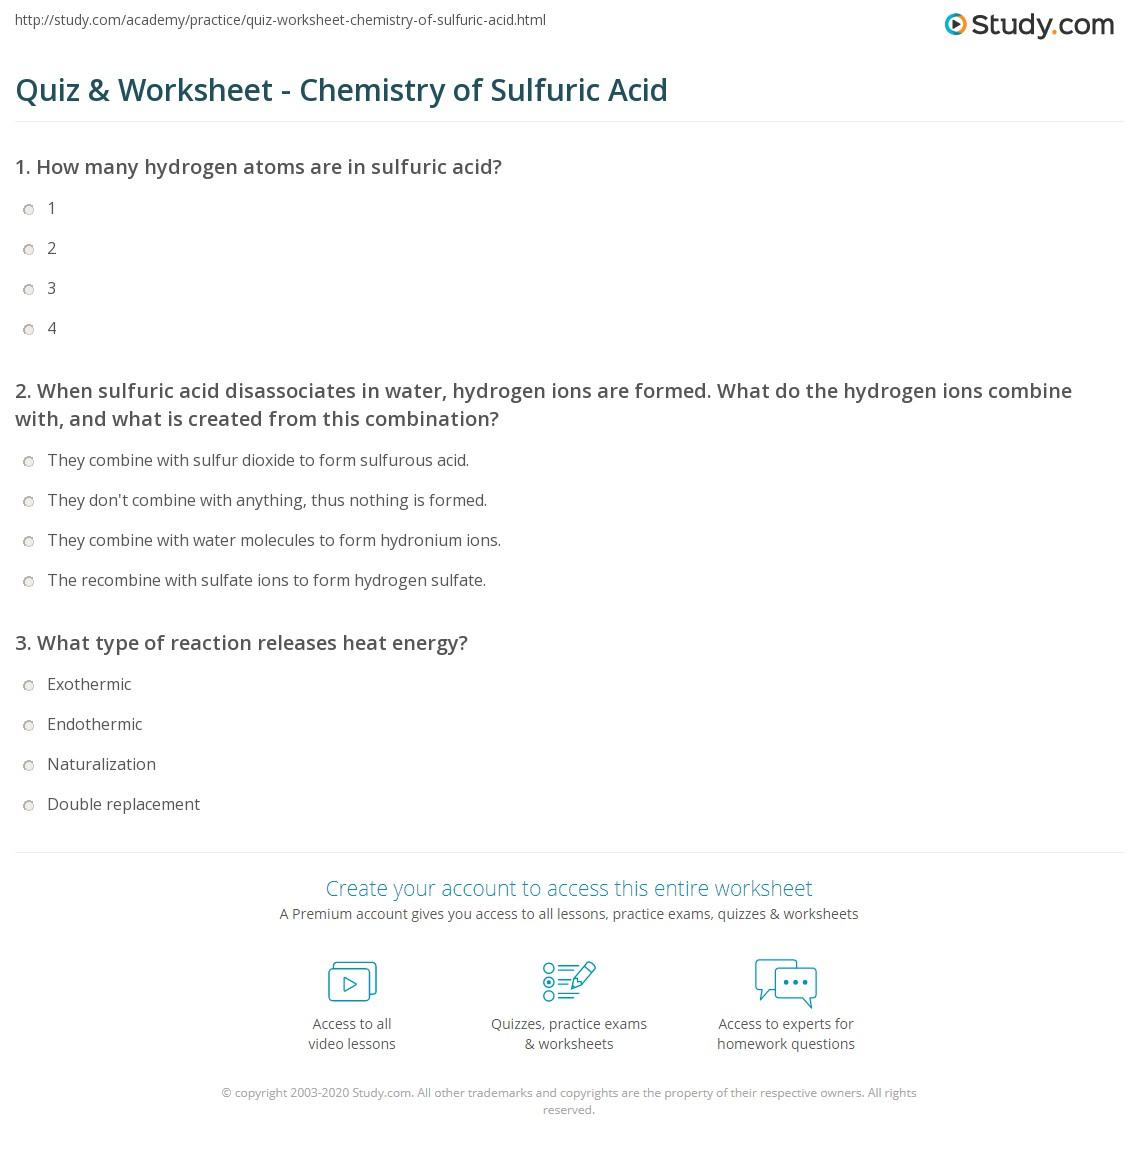 worksheet Double Replacement Reactions Worksheet quiz worksheet chemistry of sulfuric acid study com print reactions ionization precautions worksheet